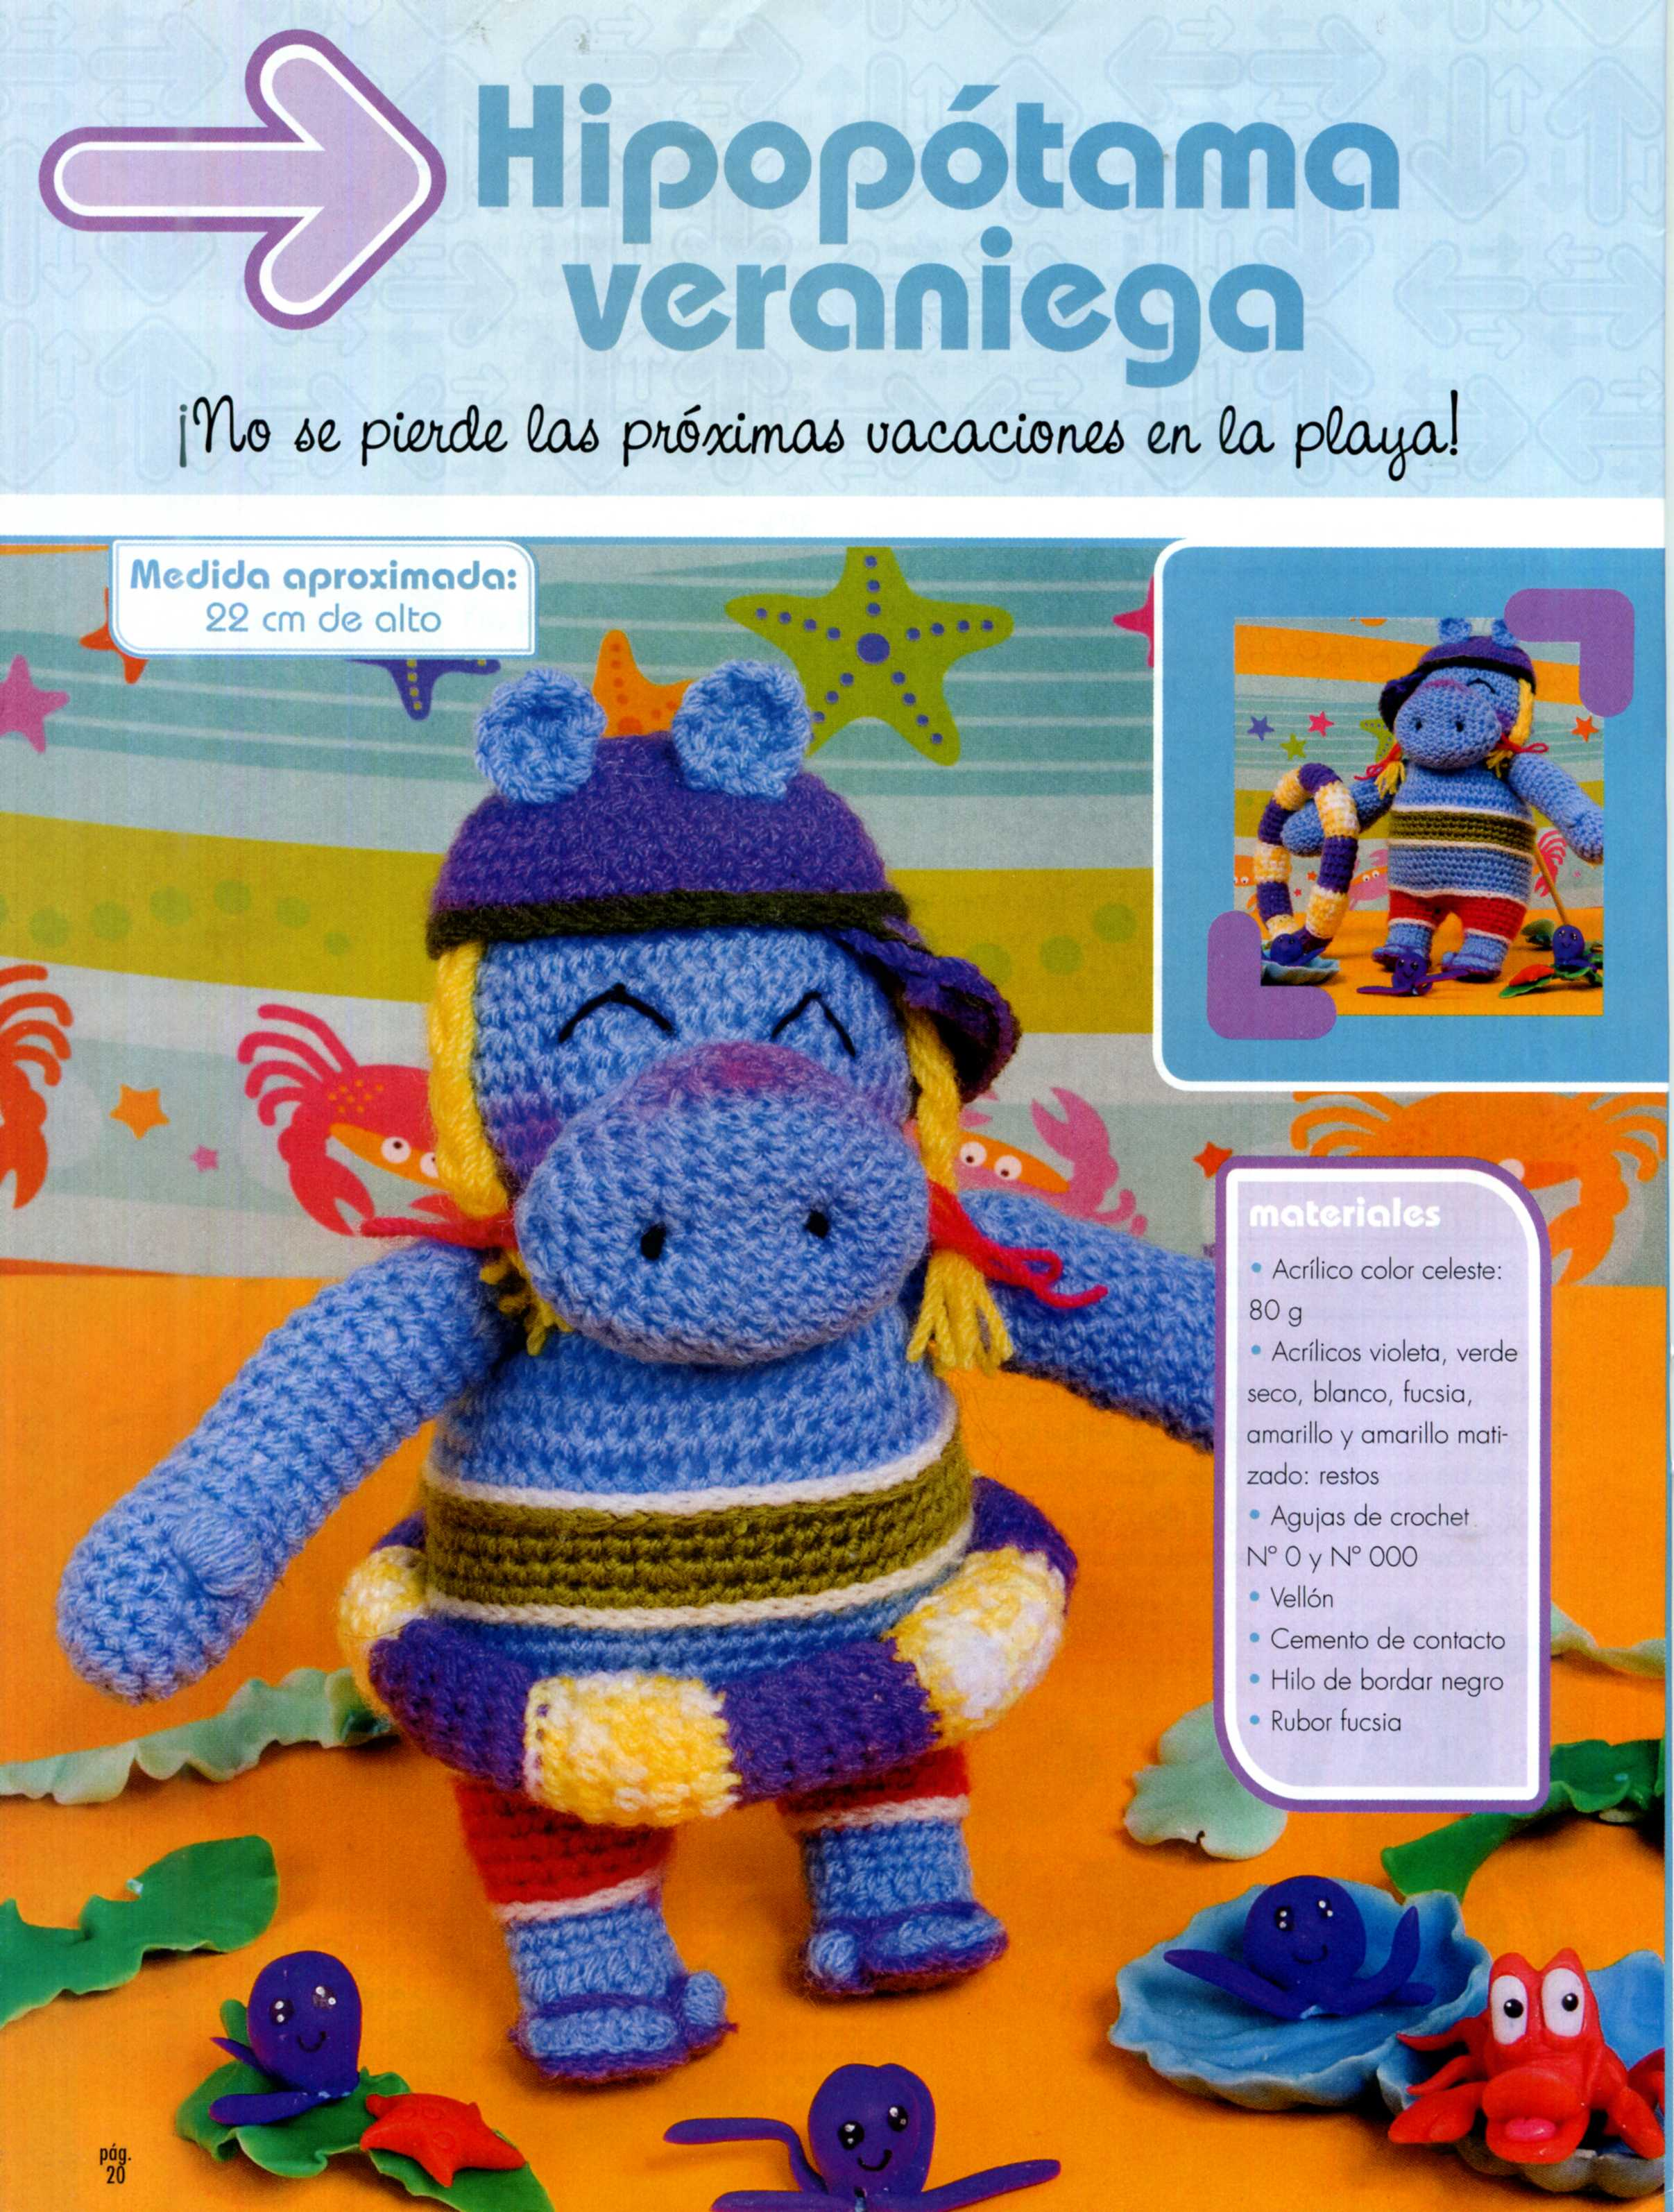 Amigurumi Cute Hippopotamus Free Crochet Pattern | Crochet toys ... | 3189x2413